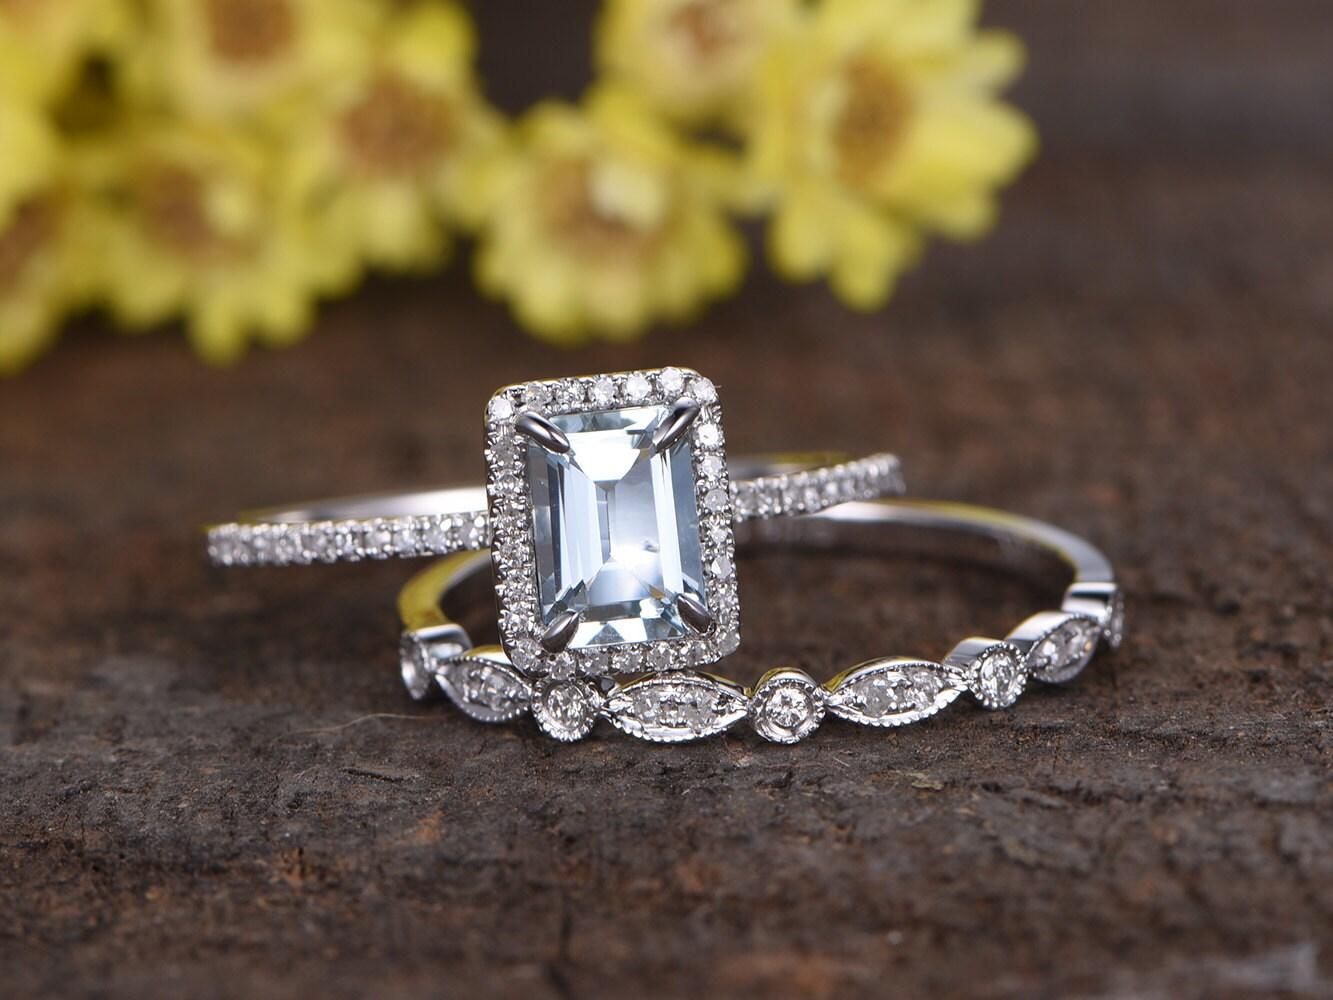 1ctw 5x7mm Emerald Cut VS Aquamarine Engagement Ring Set